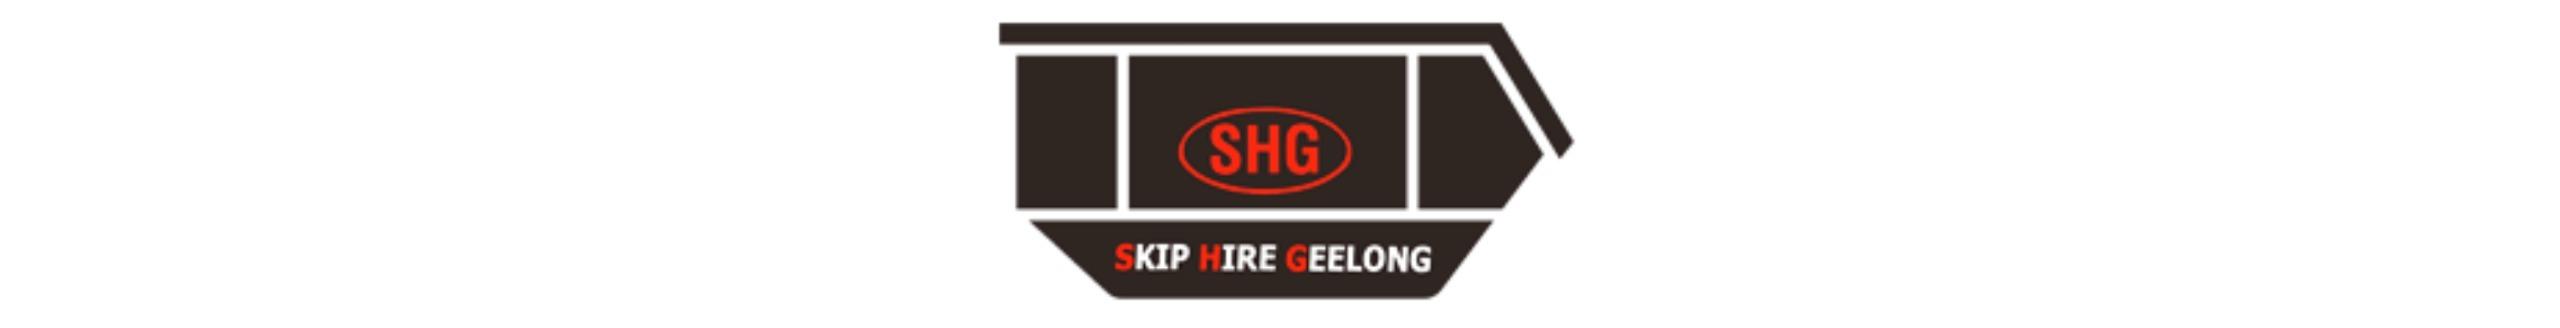 Skip Hire Geelong (@skiphiregeelong) Cover Image